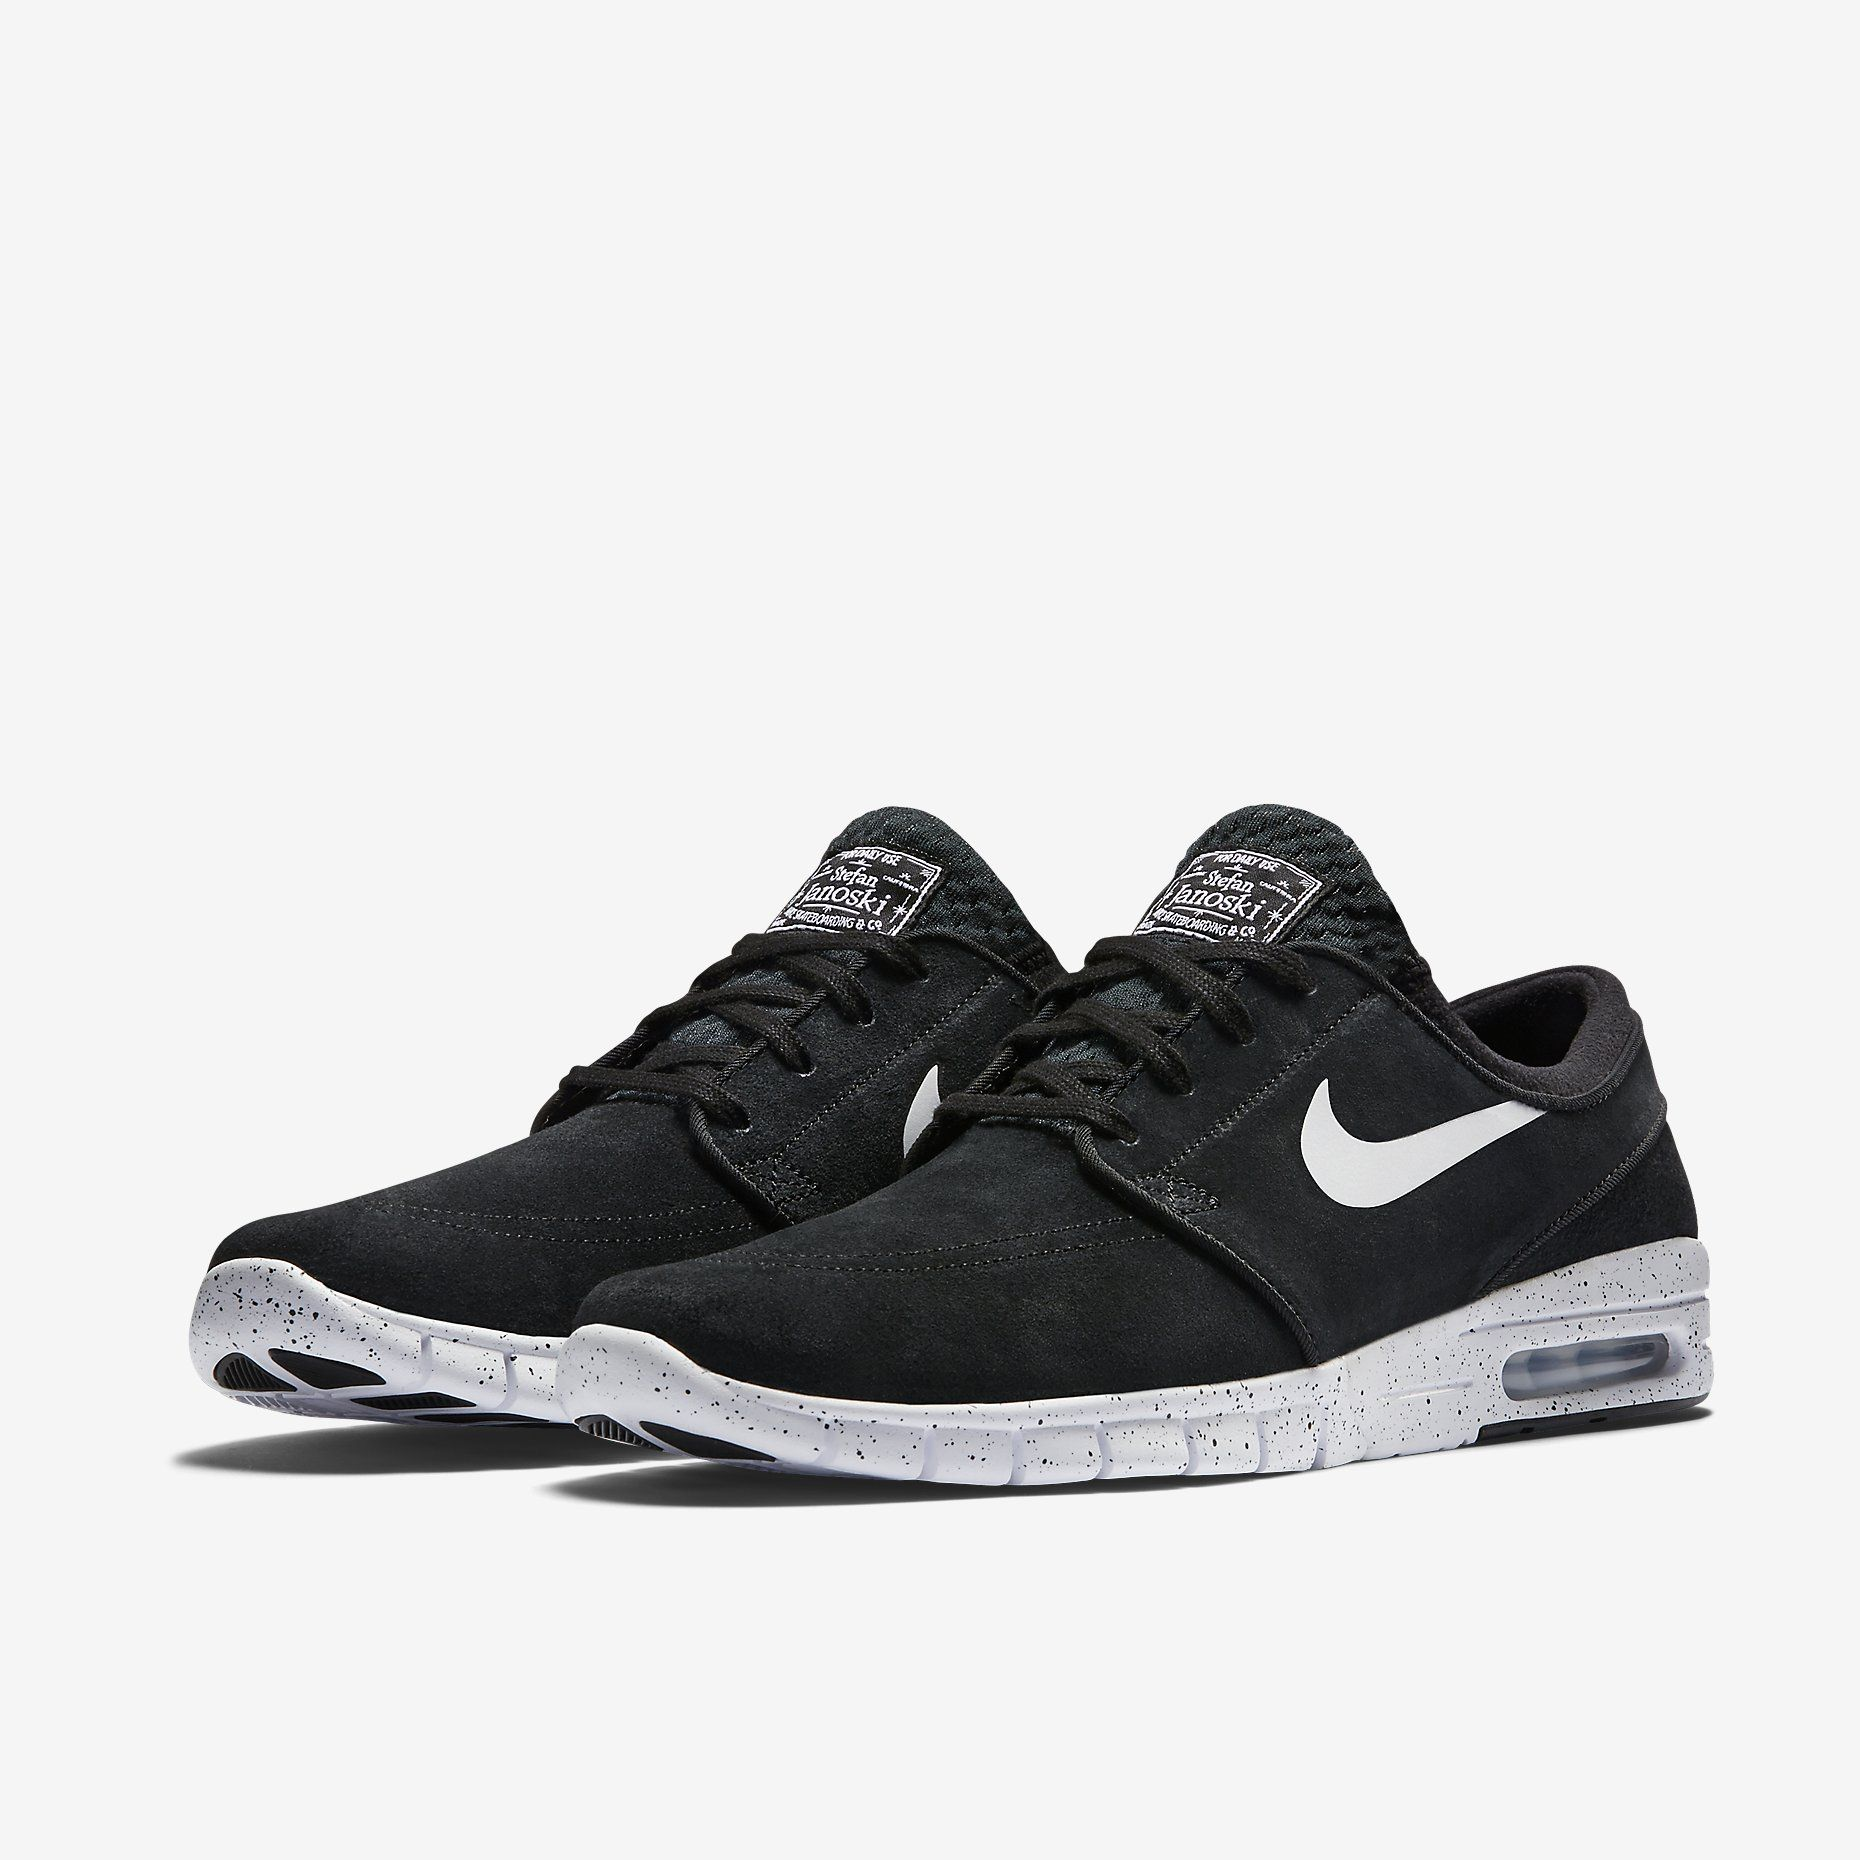 Nike Sb Stefan Janoski Max Suede Men S Skateboarding Shoe Nike Store Nike Sb Shoes Sb Stefan Janoski Max Nike Sb